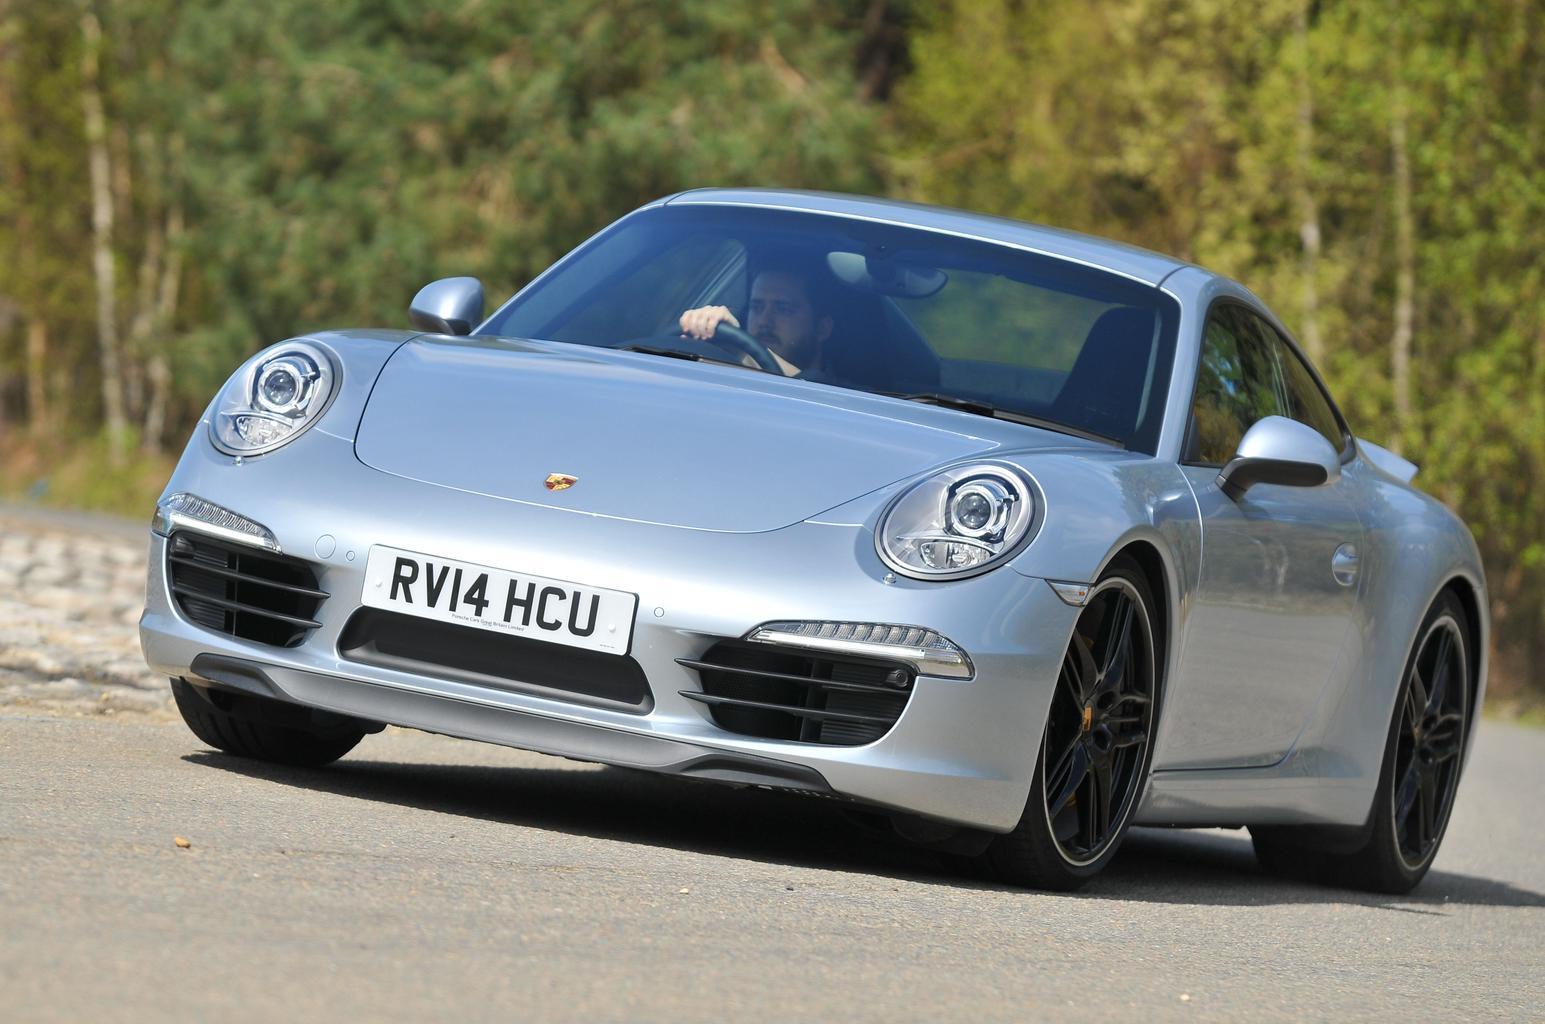 Used Porsche 911 vs Jaguar F-Type Coupe